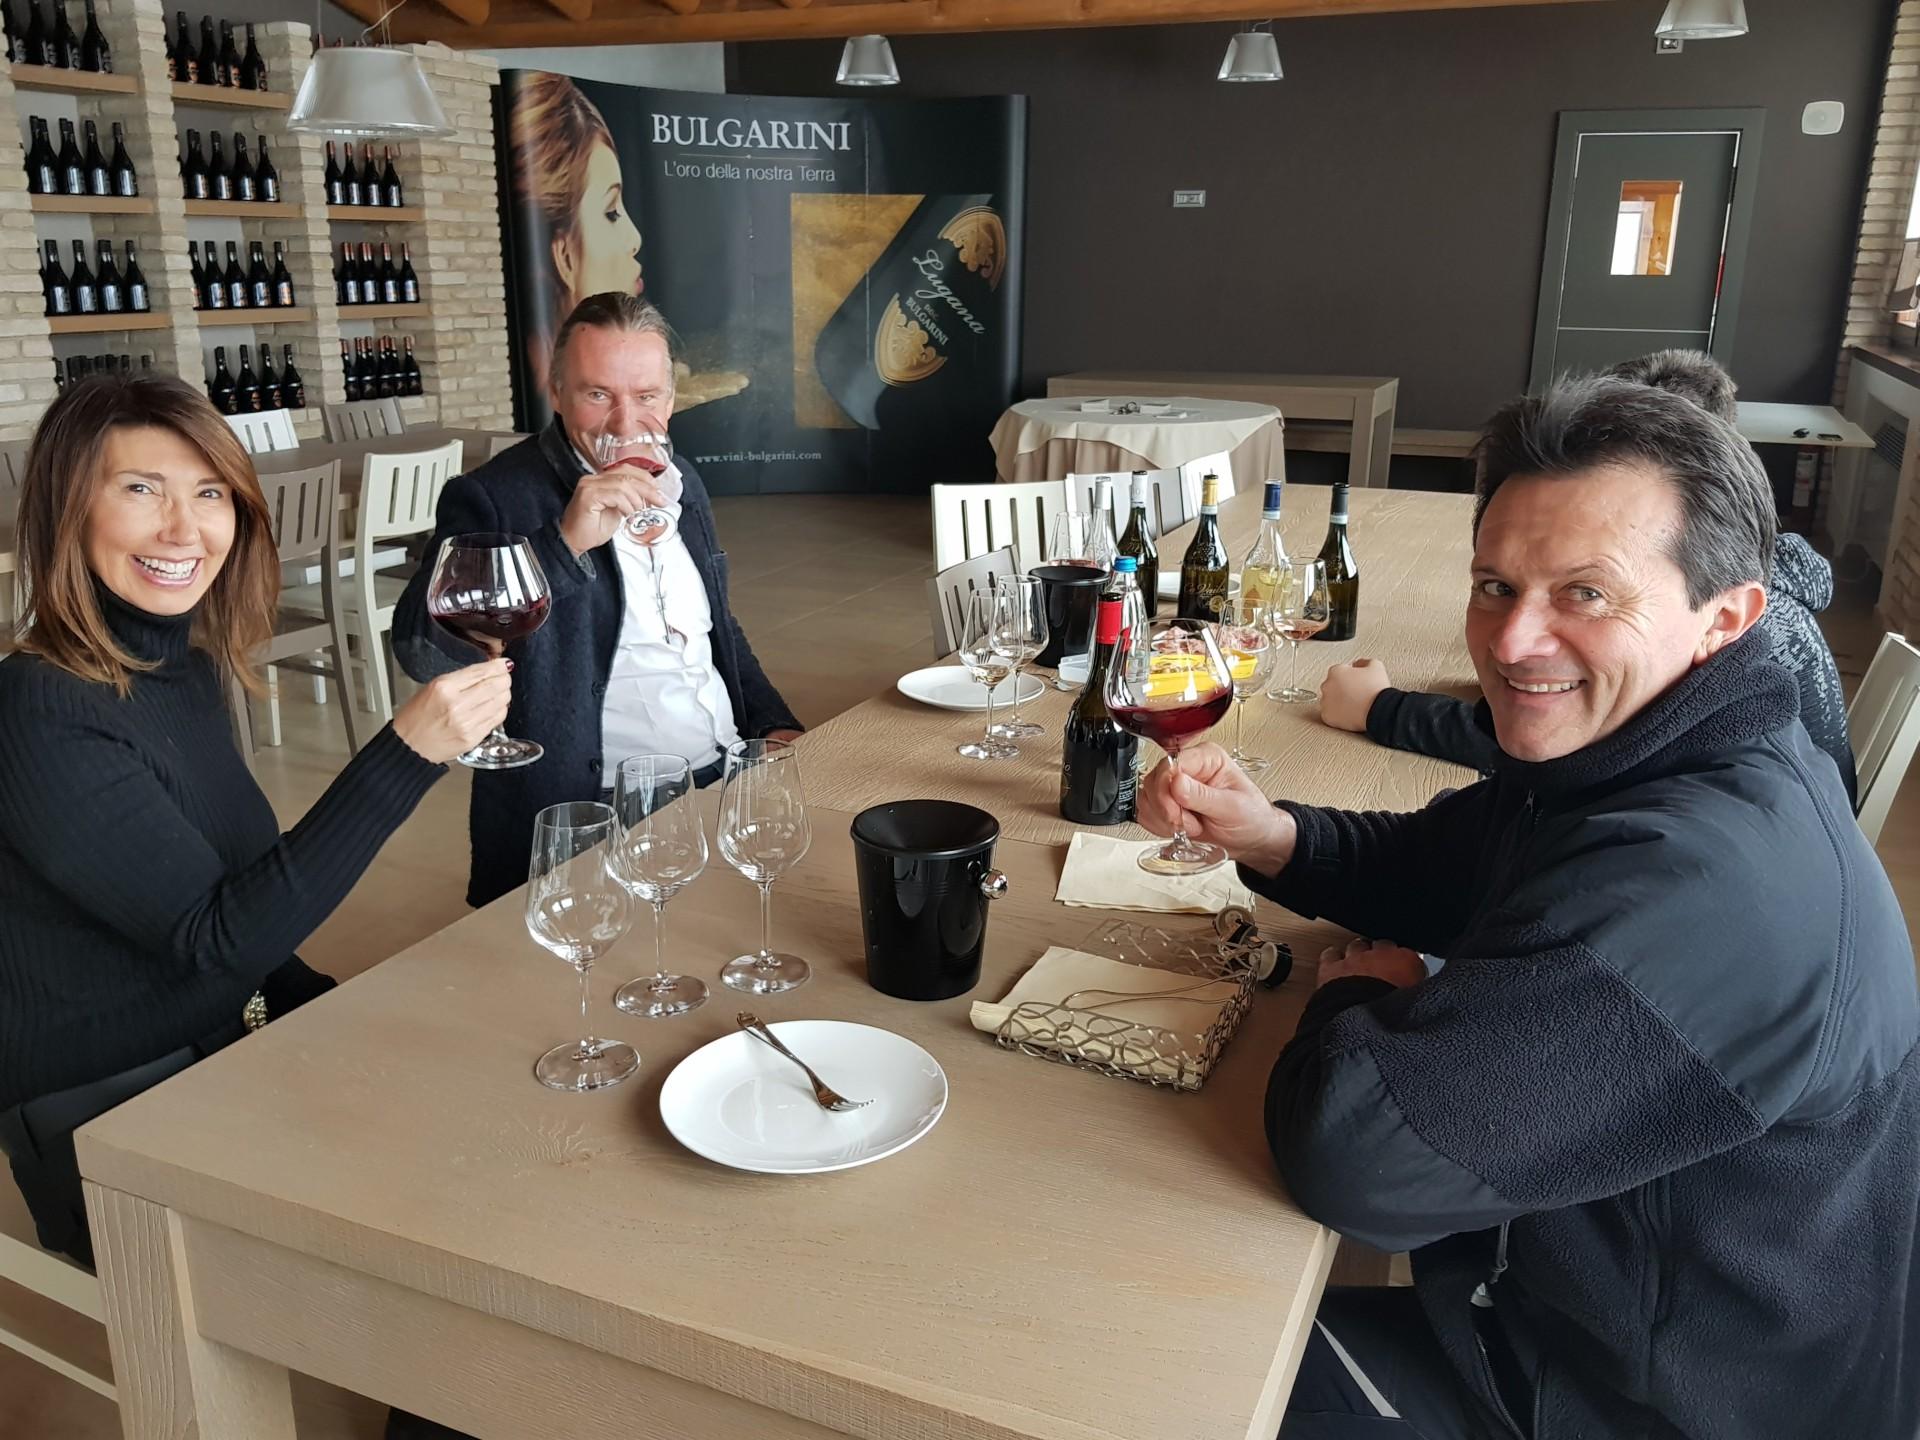 Michael Liebert bei Fausto Bulgarini